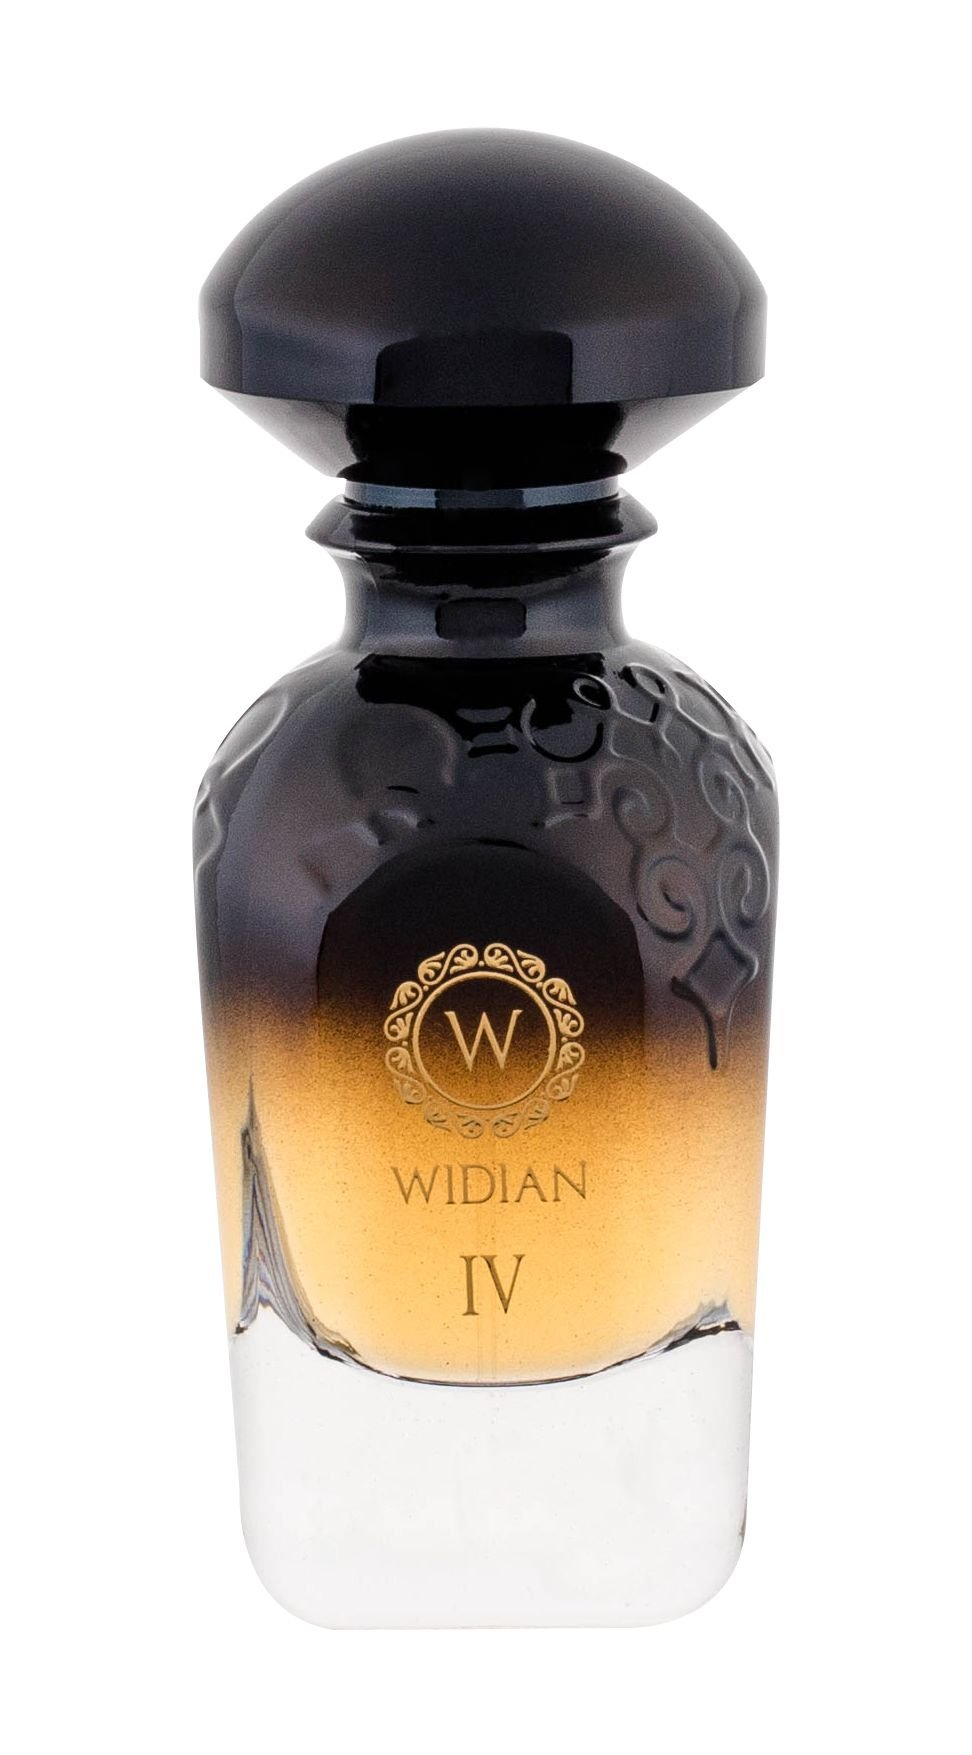 Widian Aj Arabia Black Collection IV Perfume 50ml